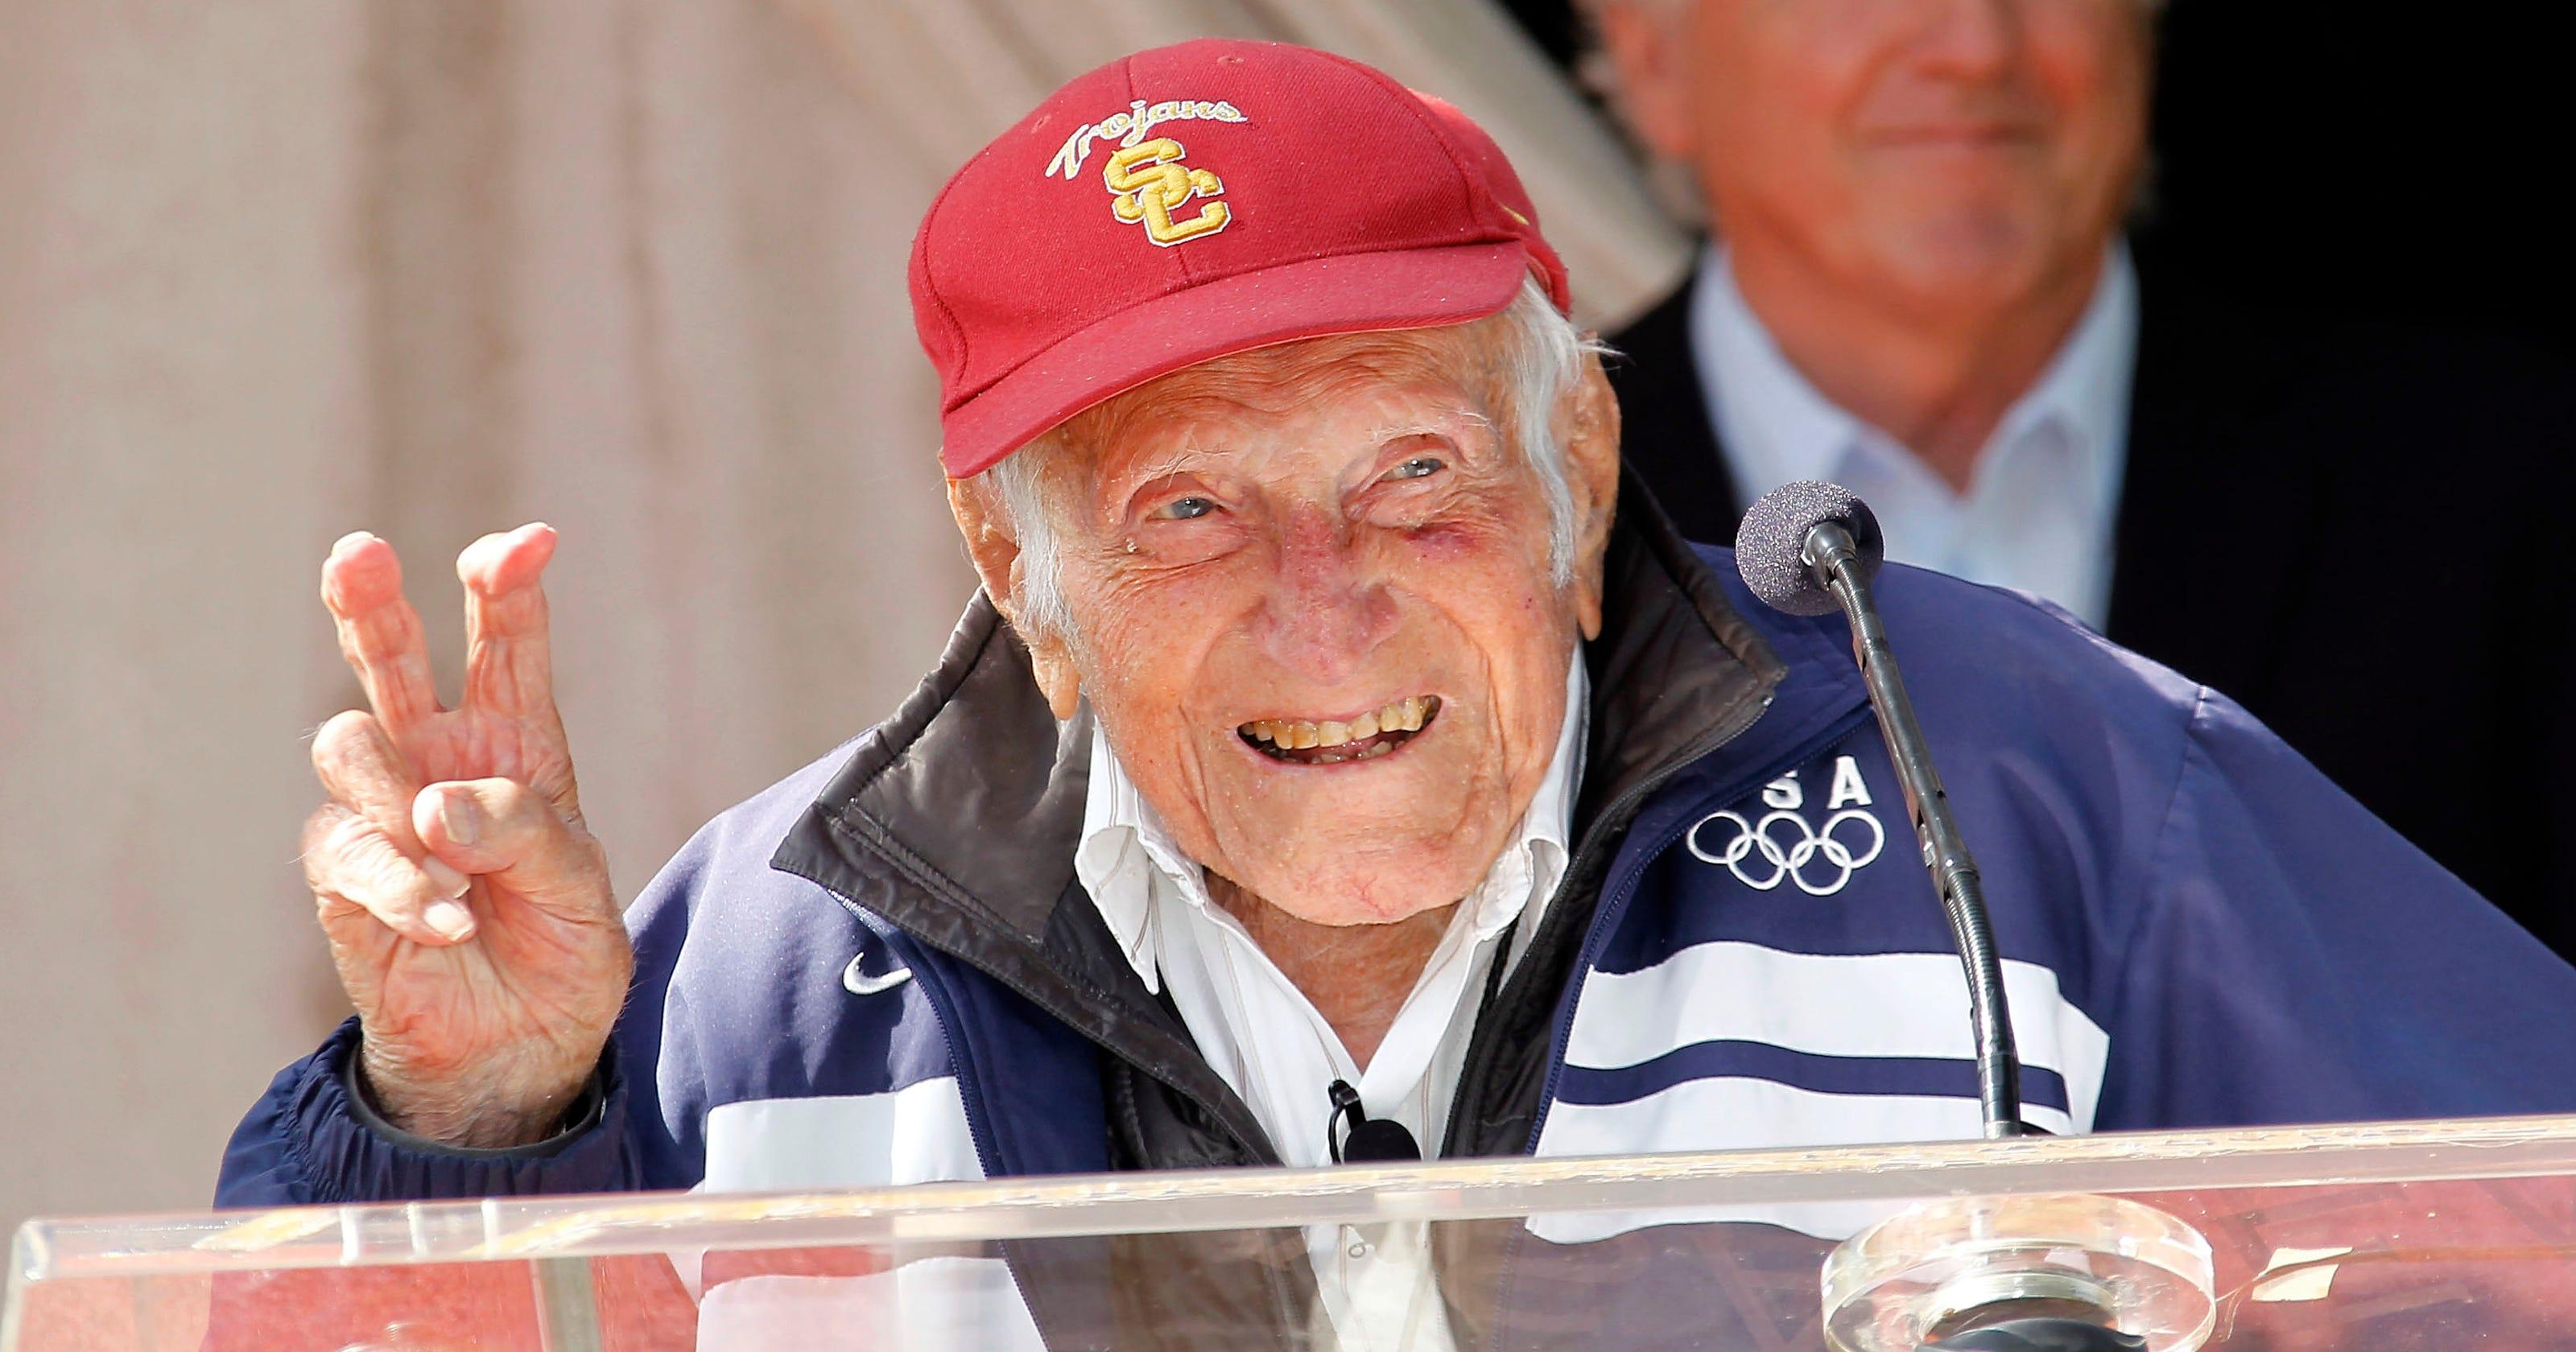 ceab9218b Louis Zamperini, World War II hero and Olympian, dies